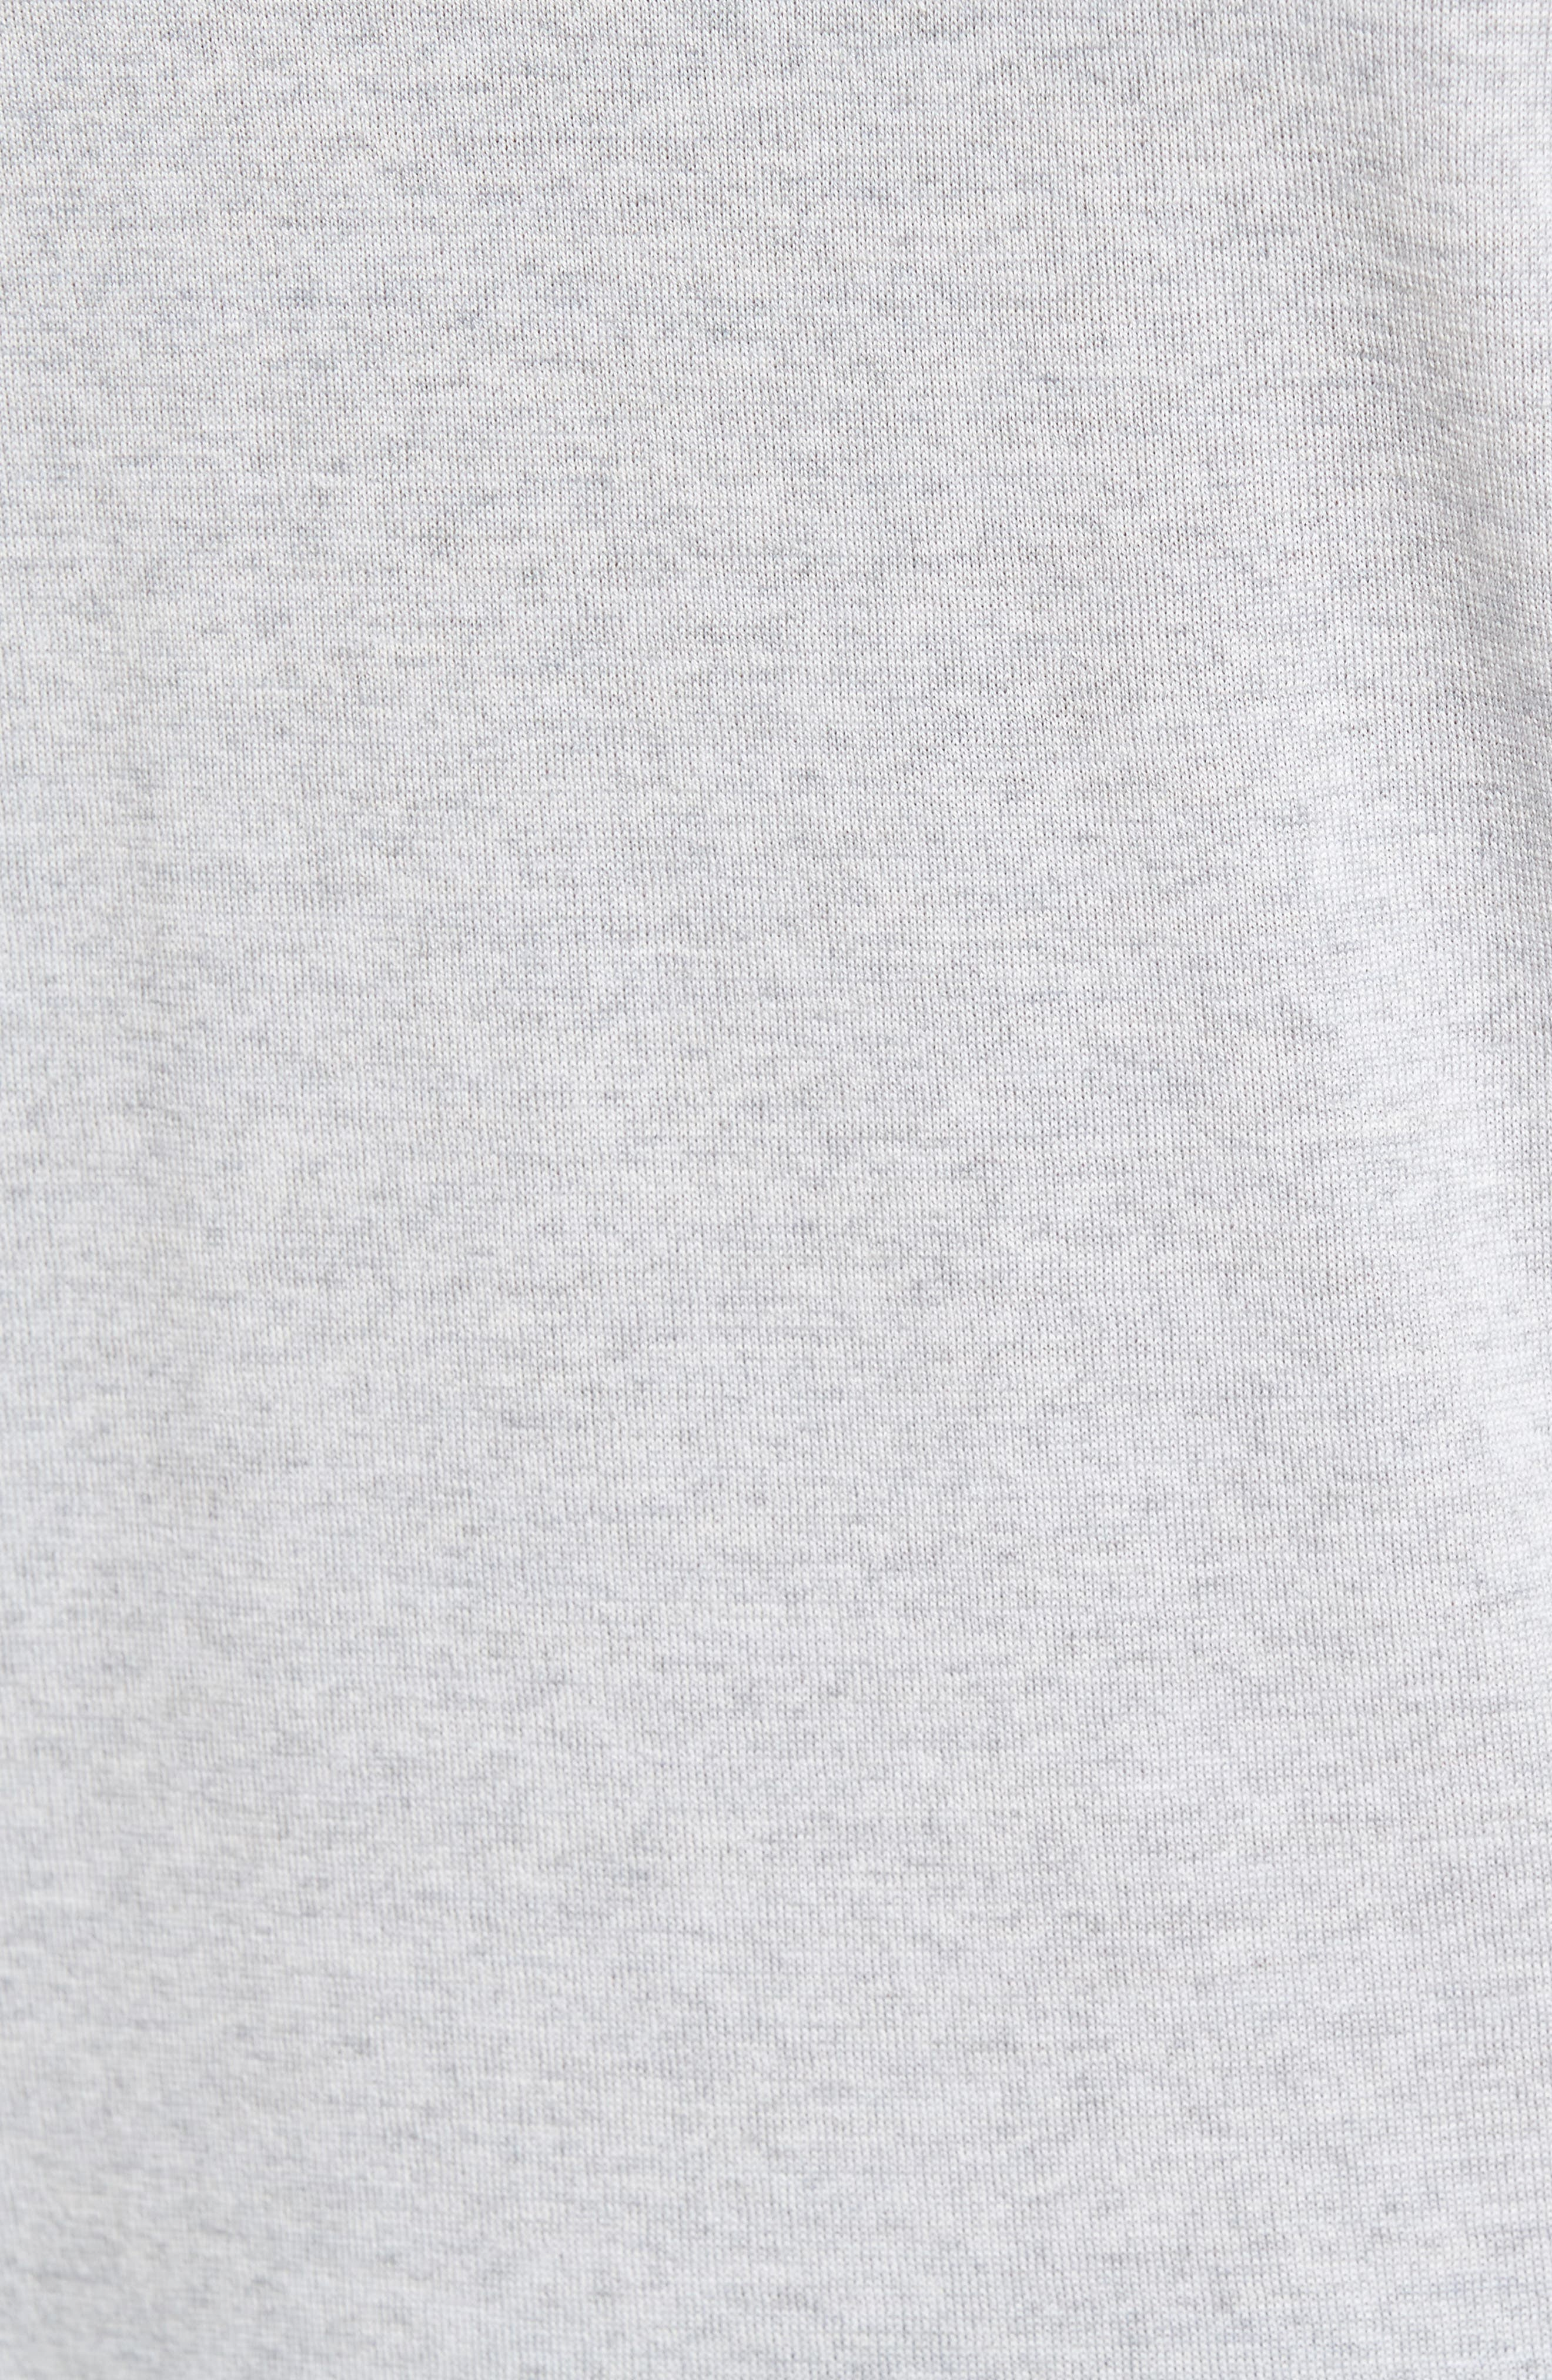 Merino Wool Sweater,                             Alternate thumbnail 15, color,